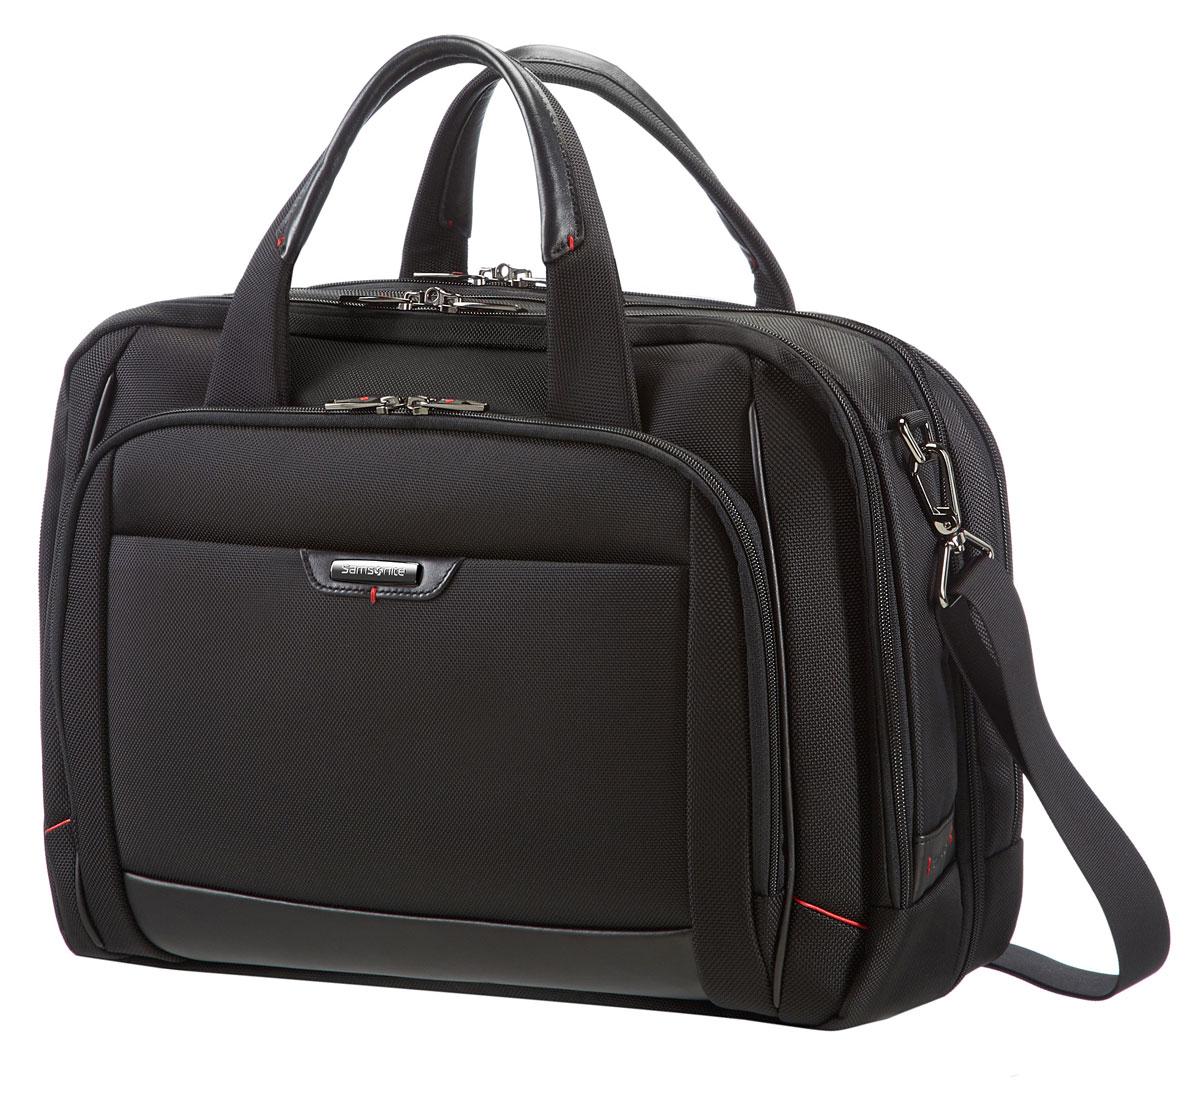 Сумка для ноутбука Samsonite, цвет: черный, 26 л. 35V*0900335V*09003